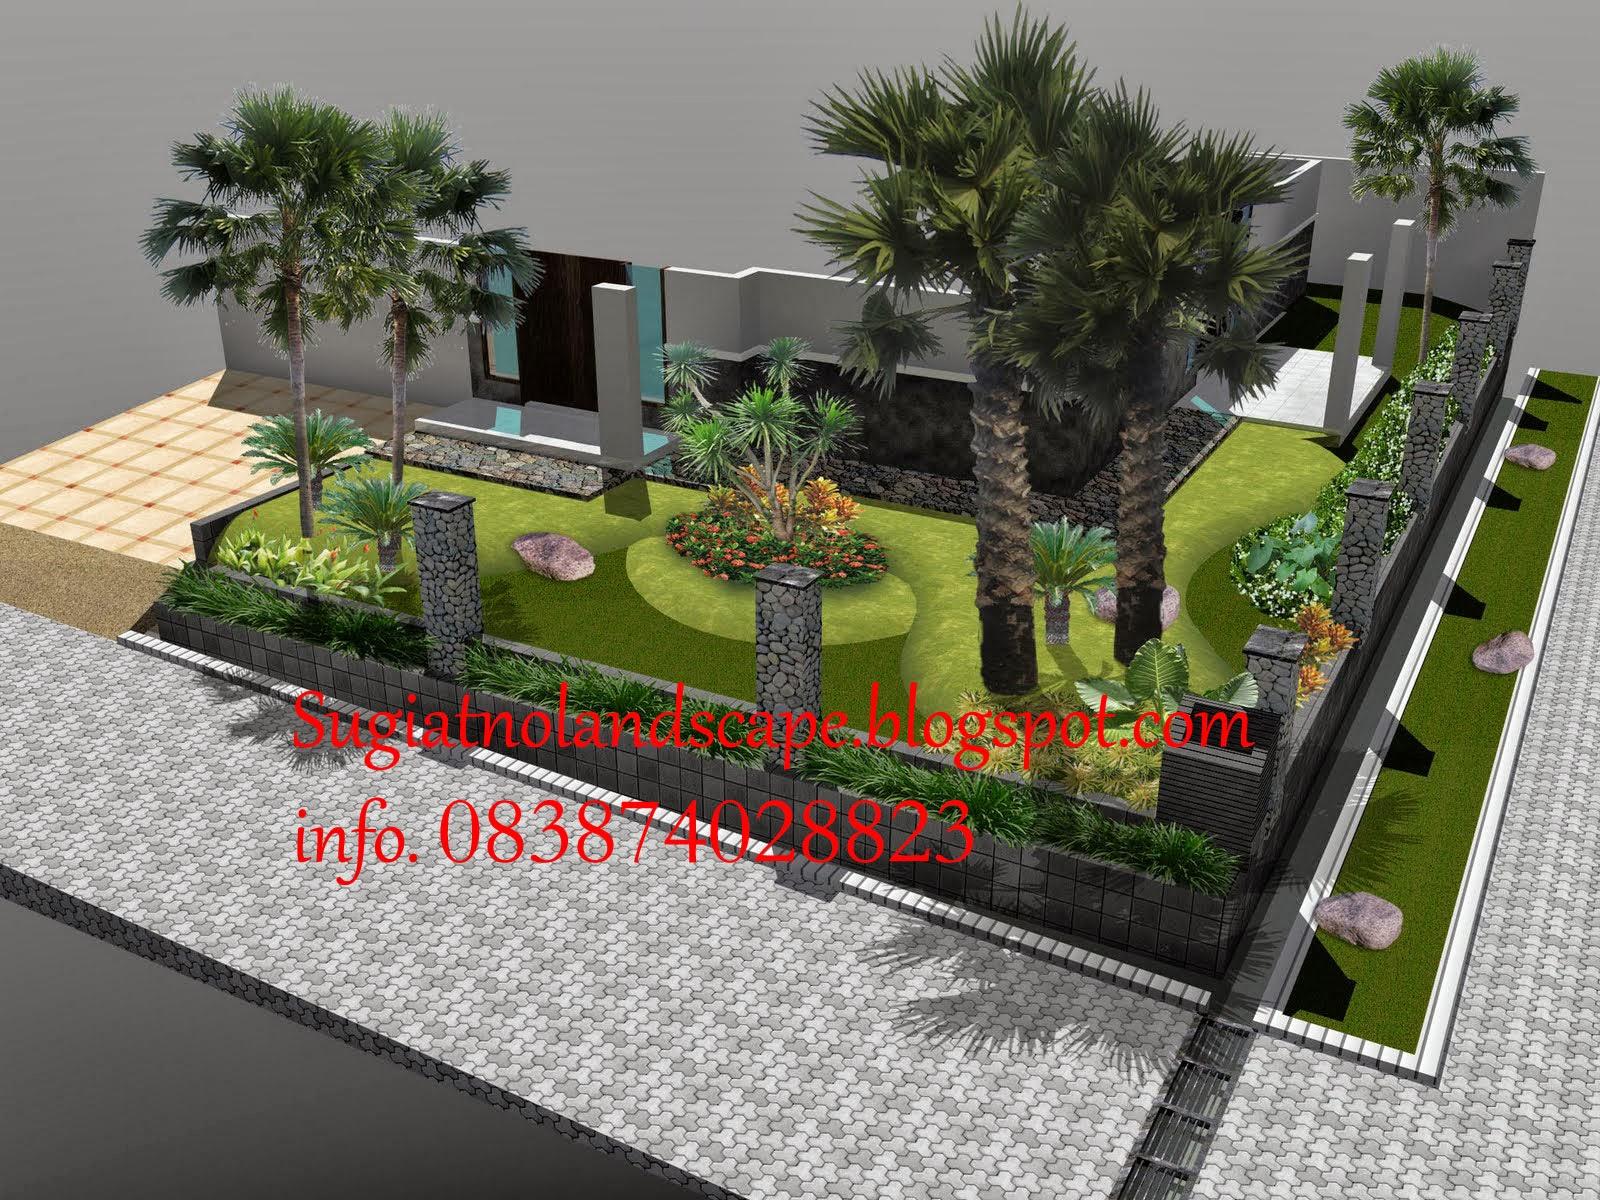 TUkang Taman Di Sentul Bogor Tukang Taman Area Pabrik Tukang